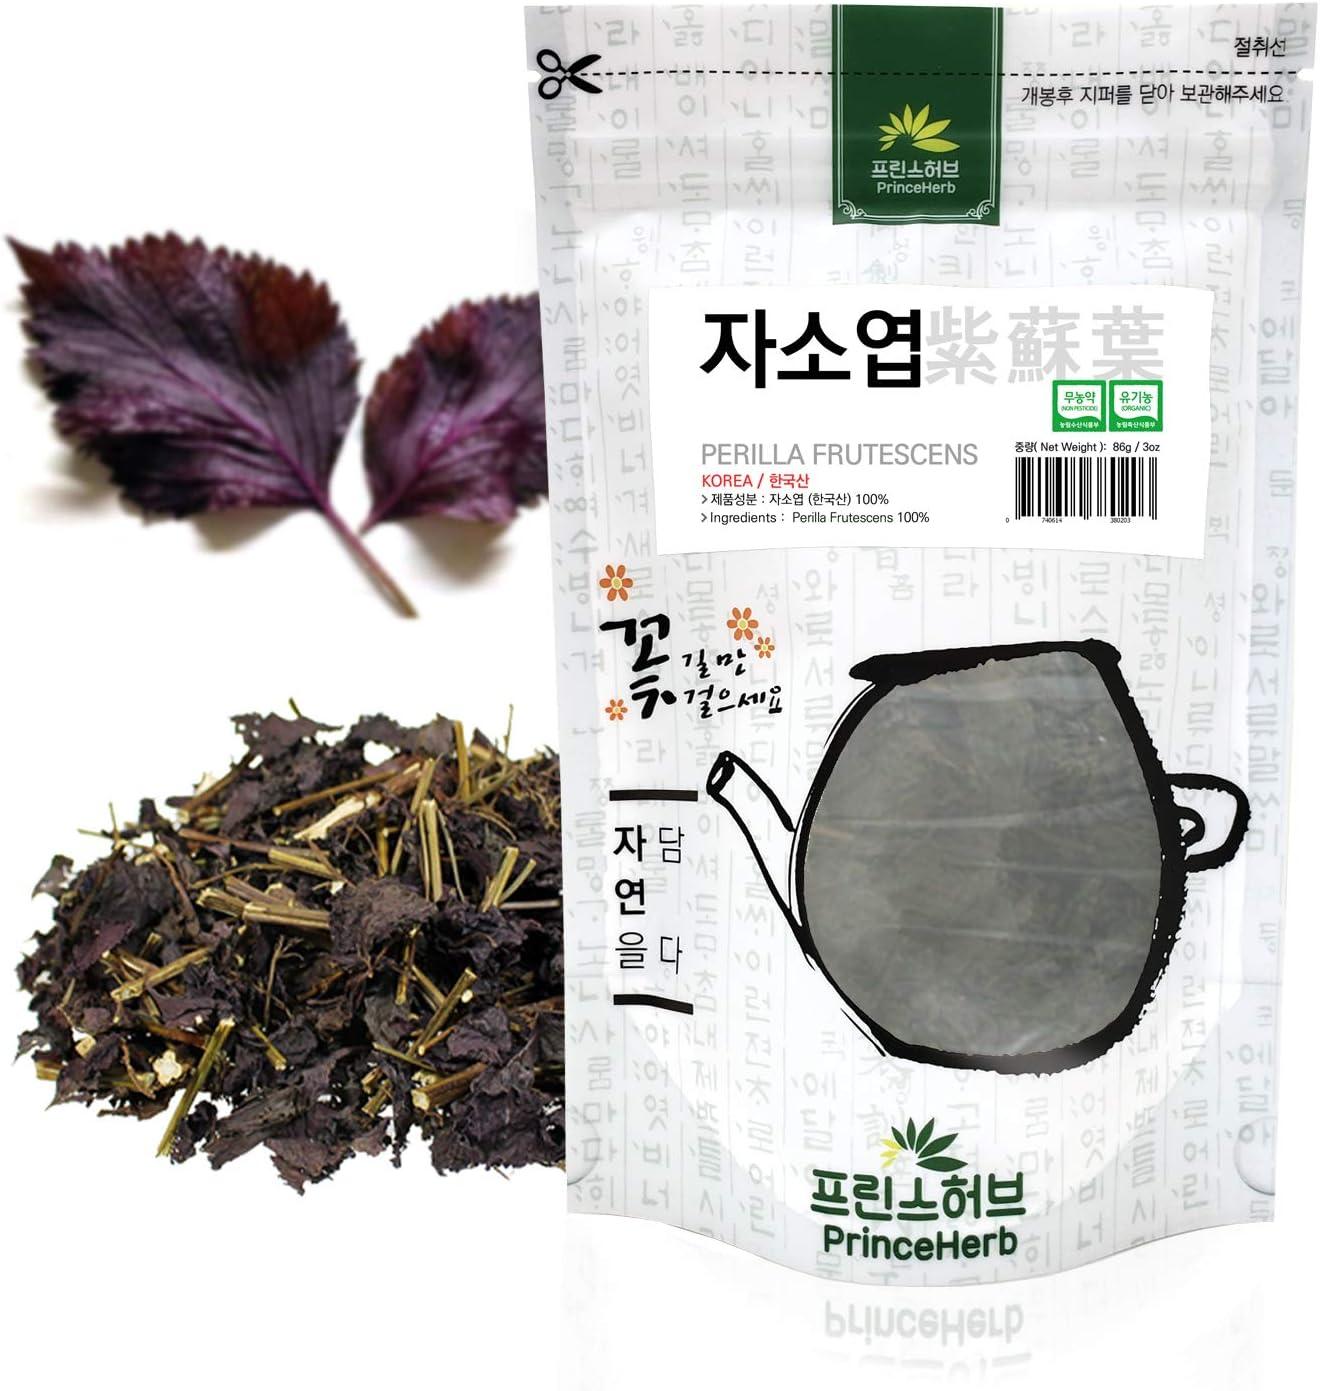 [Medicinal Korean Herb] Perilla Frutescens (Perillae Folium/Zisuye/자소엽) Dried Loose Leaves 3oz (86g)